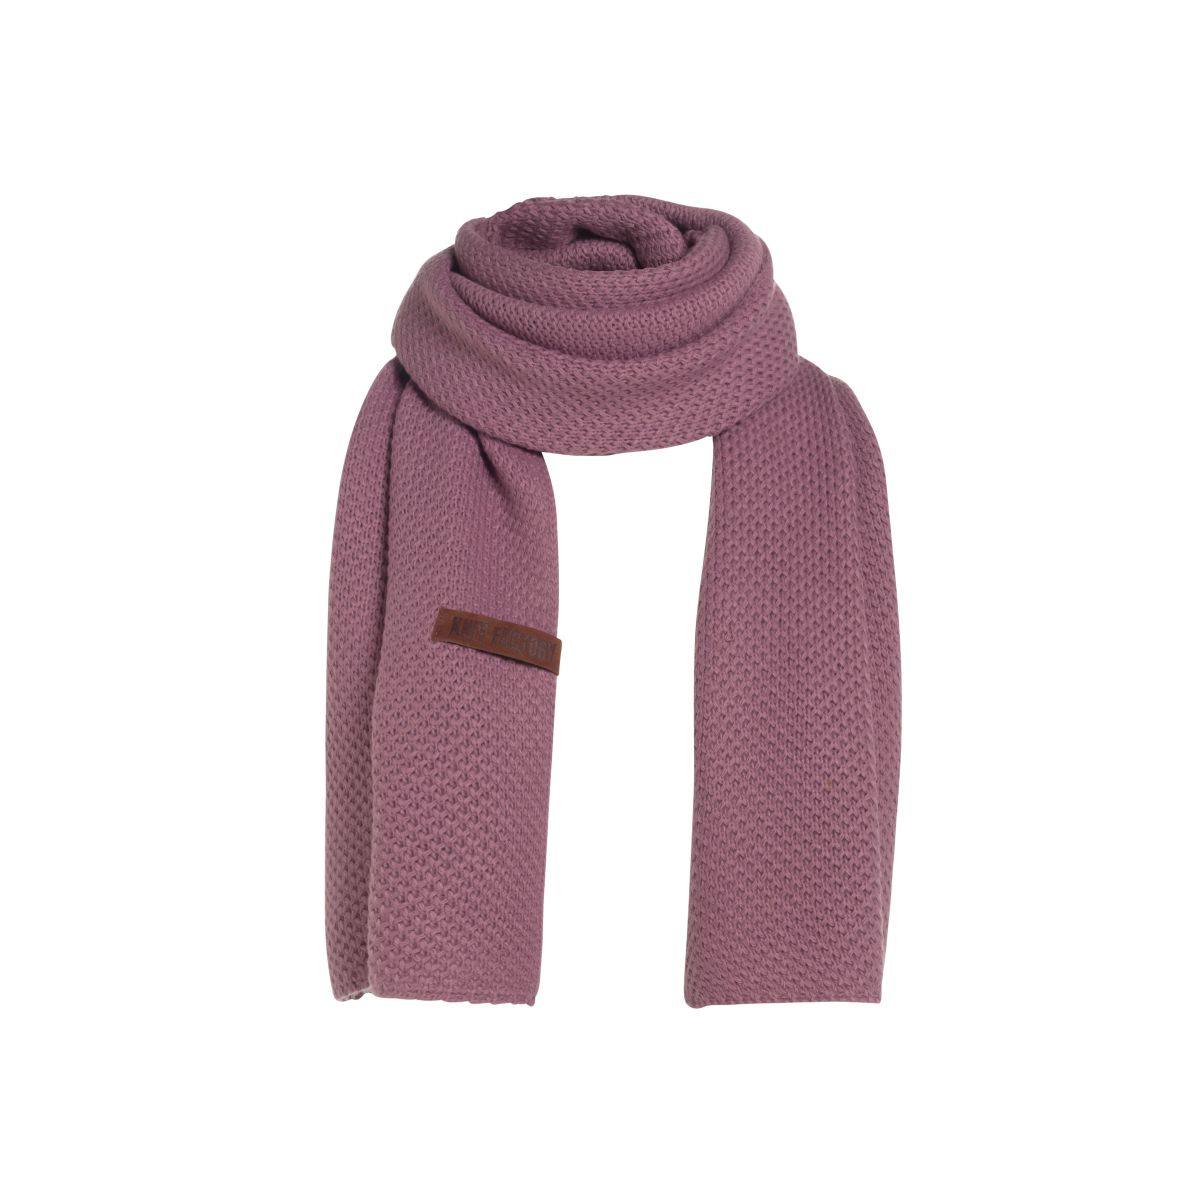 knit factory 1236527 jazz sjaal lila 1